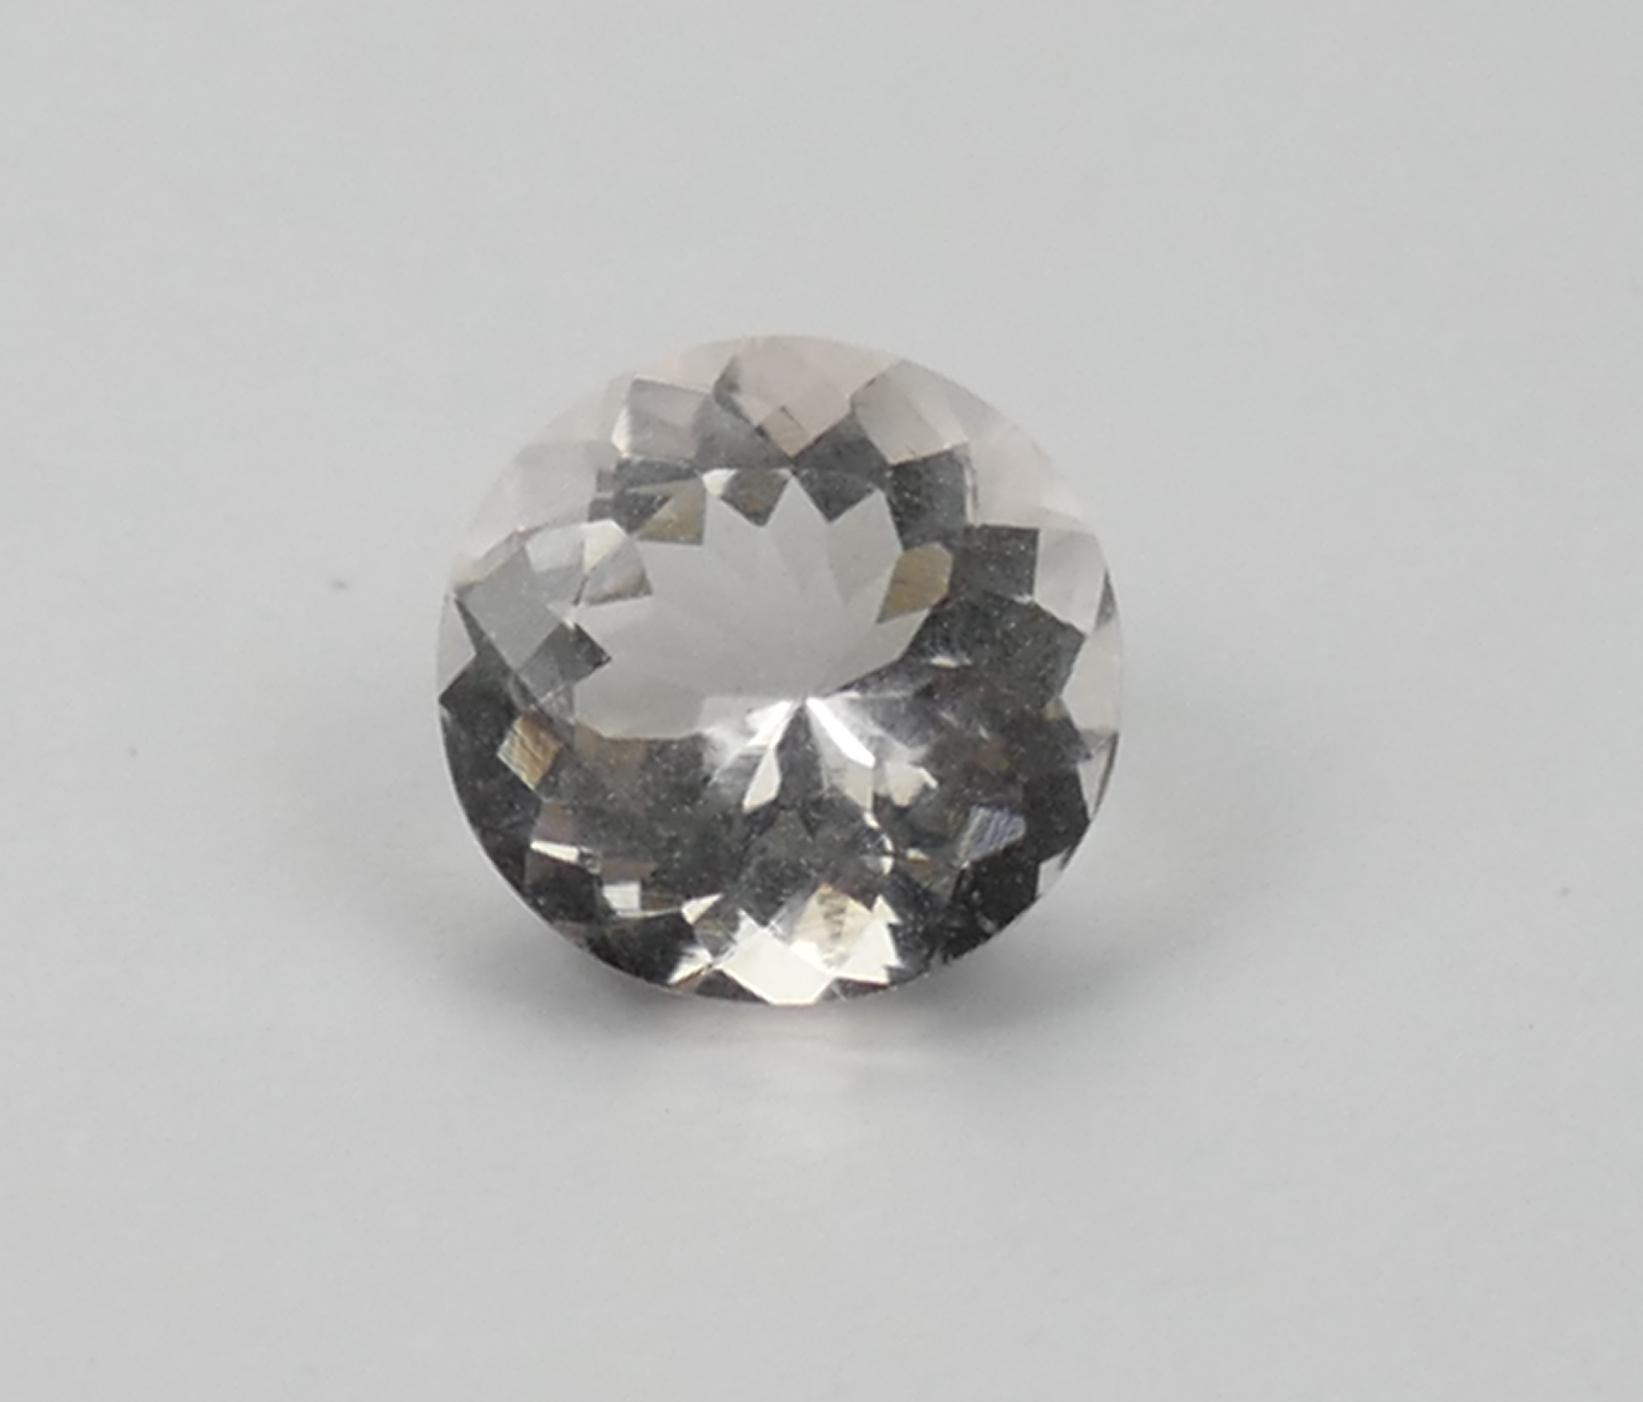 7.2mm Superbe Morganite Béryl rose léger taille brillant rond spéciale 1.16ct Madagascar (#PB328)